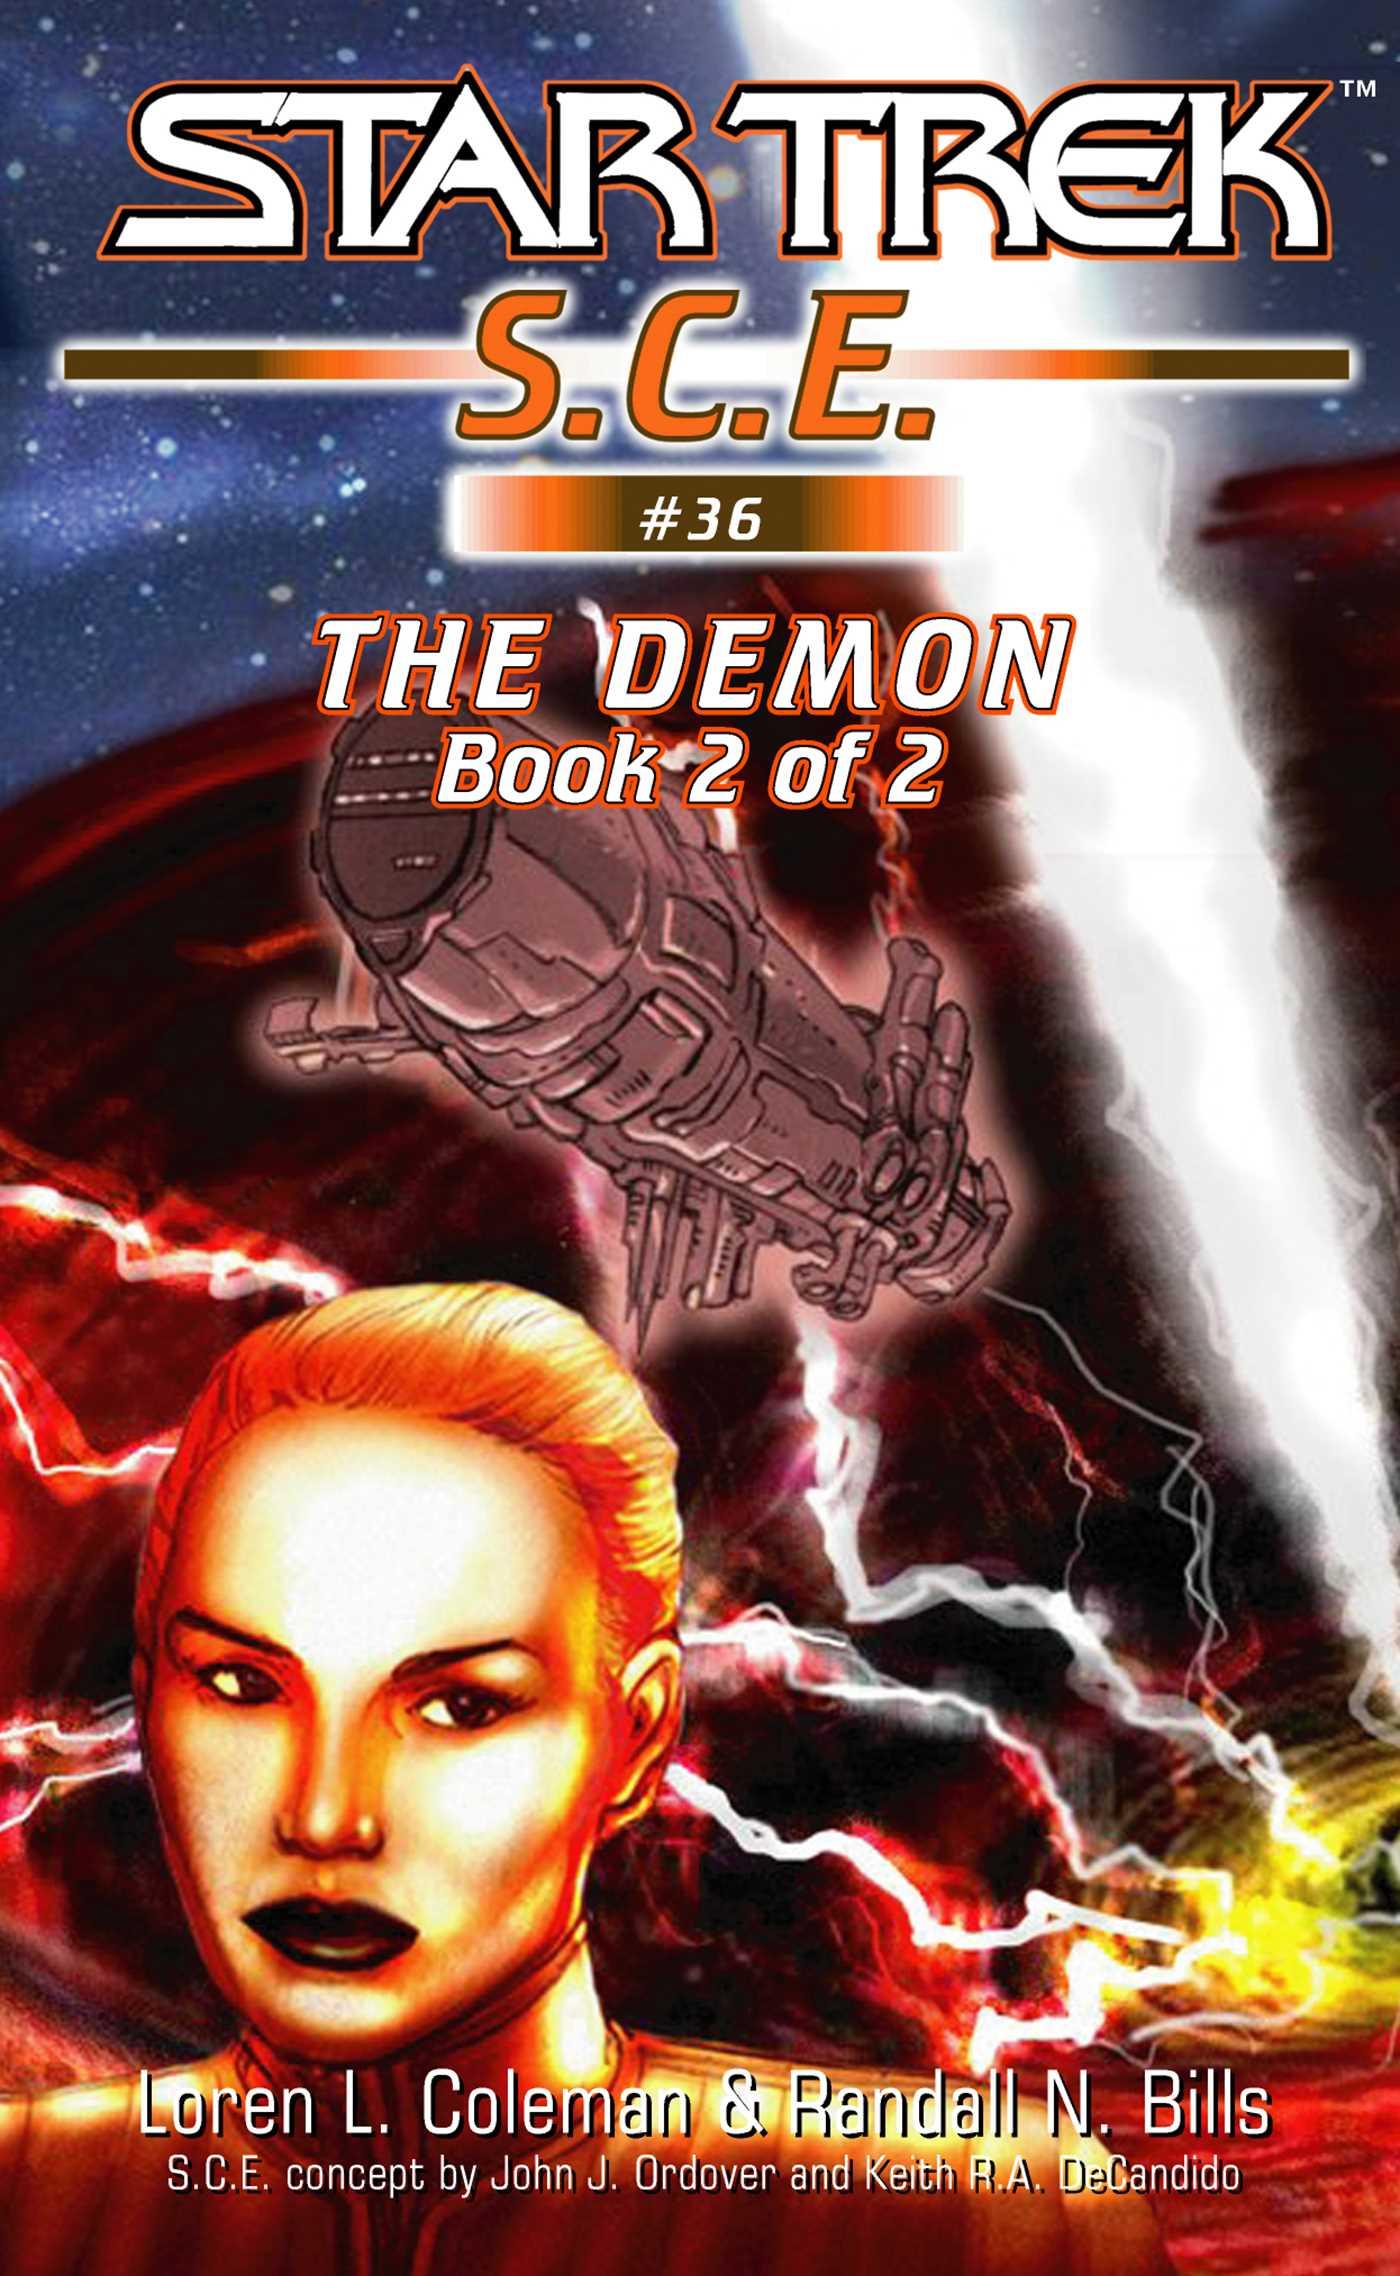 Star trek the demon book 2 9780743476102 hr